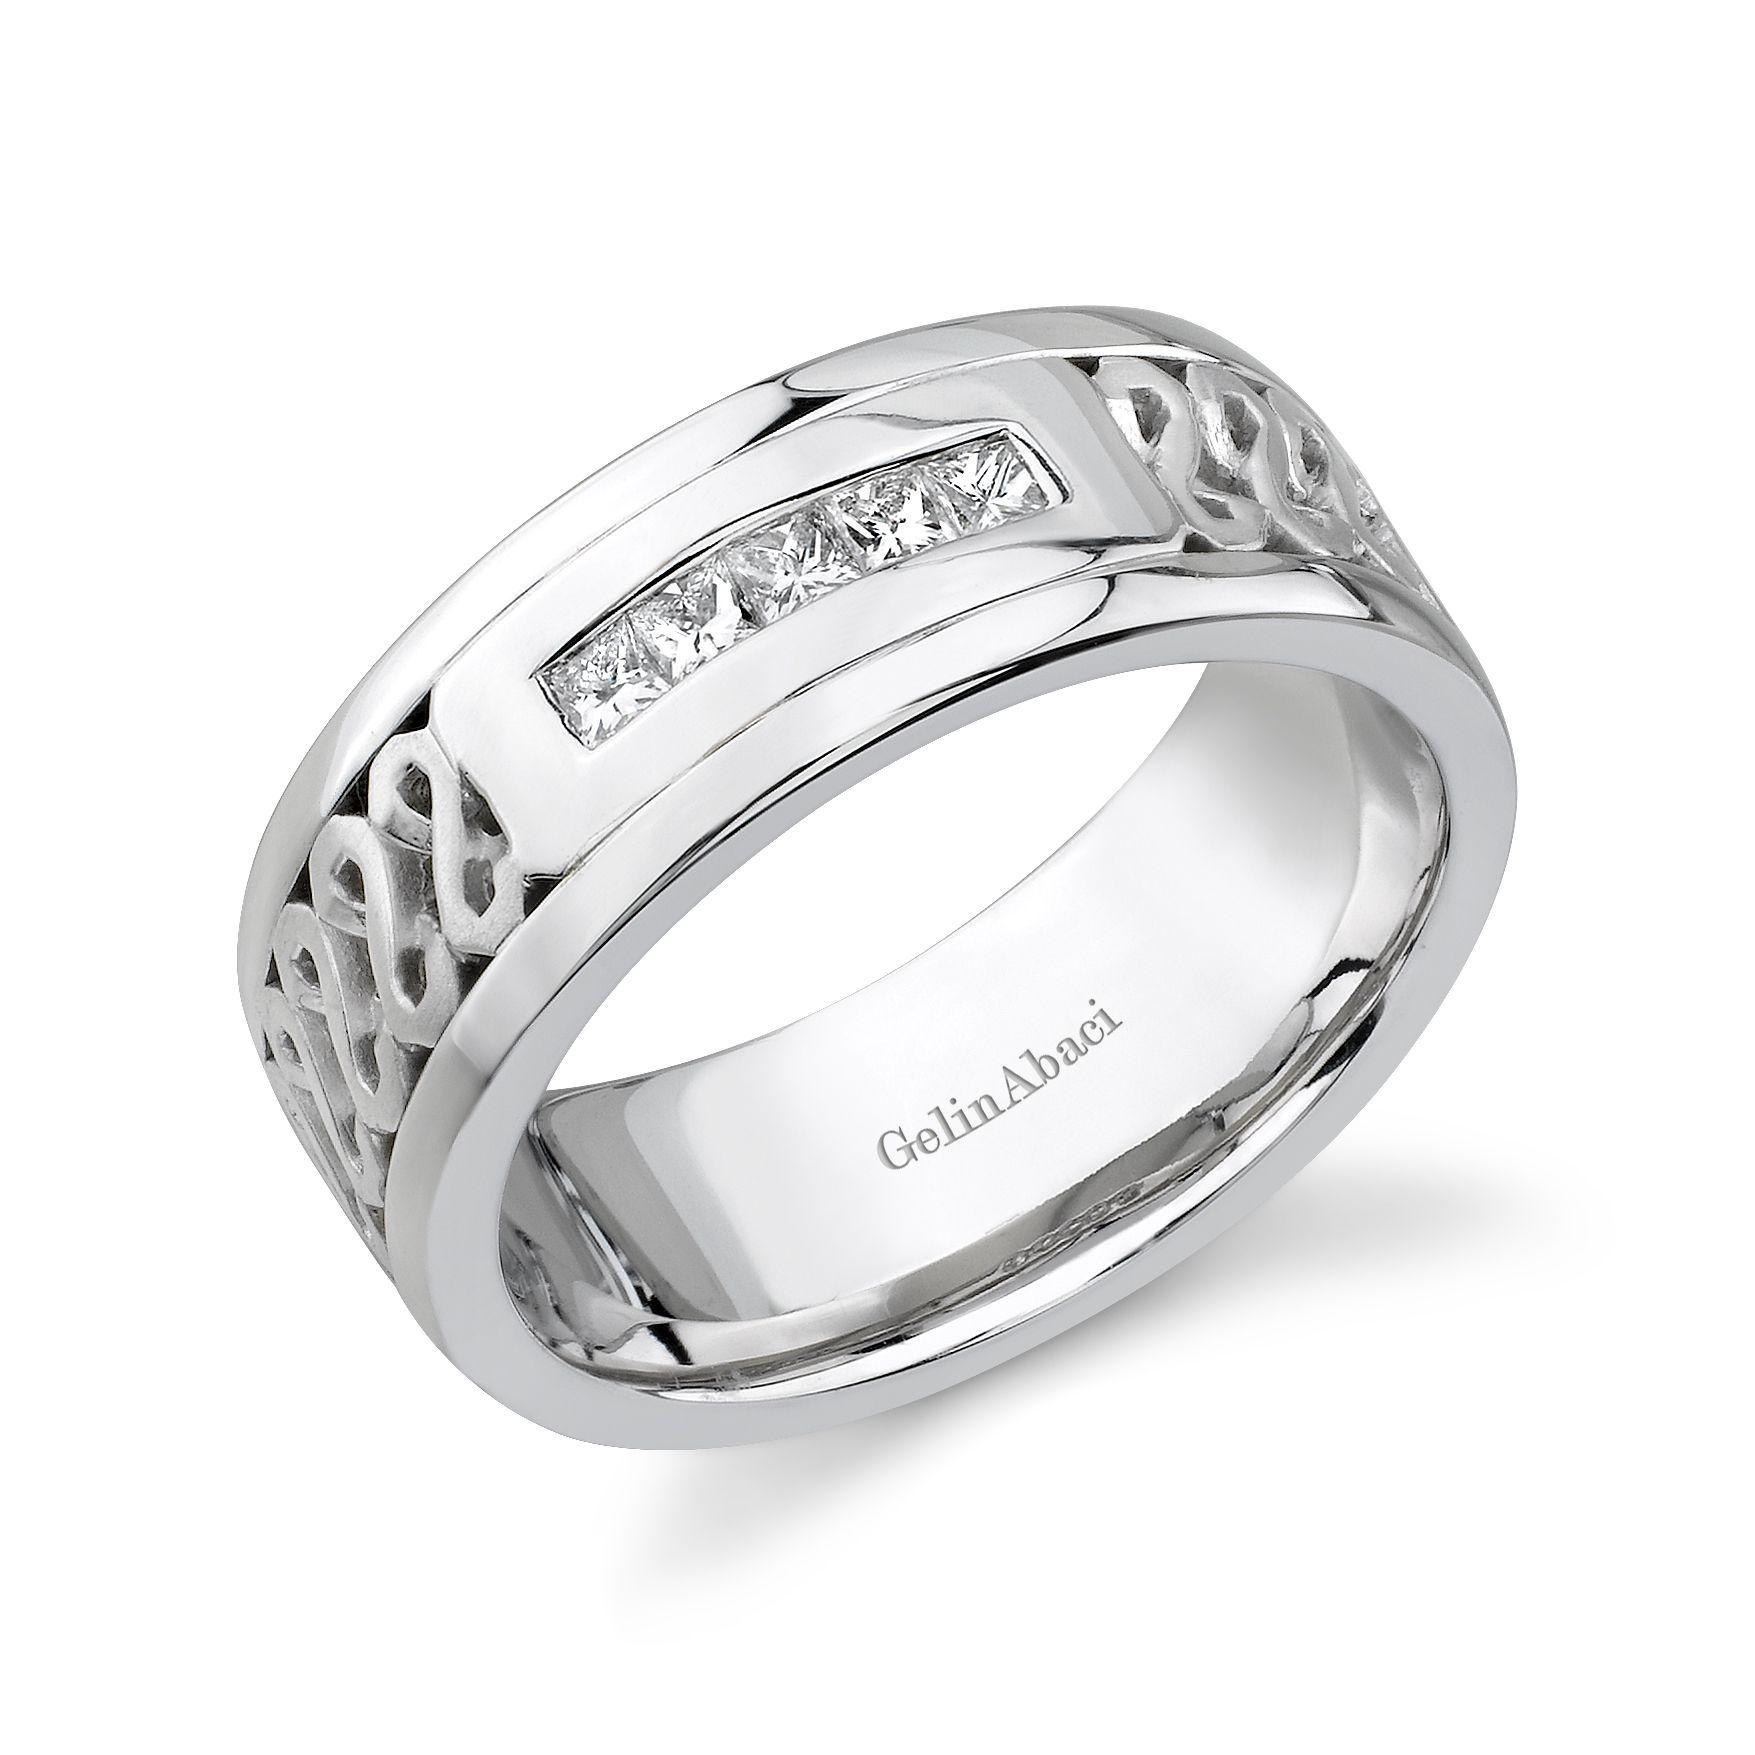 Beautiful diamond and platinum wedding band for him.